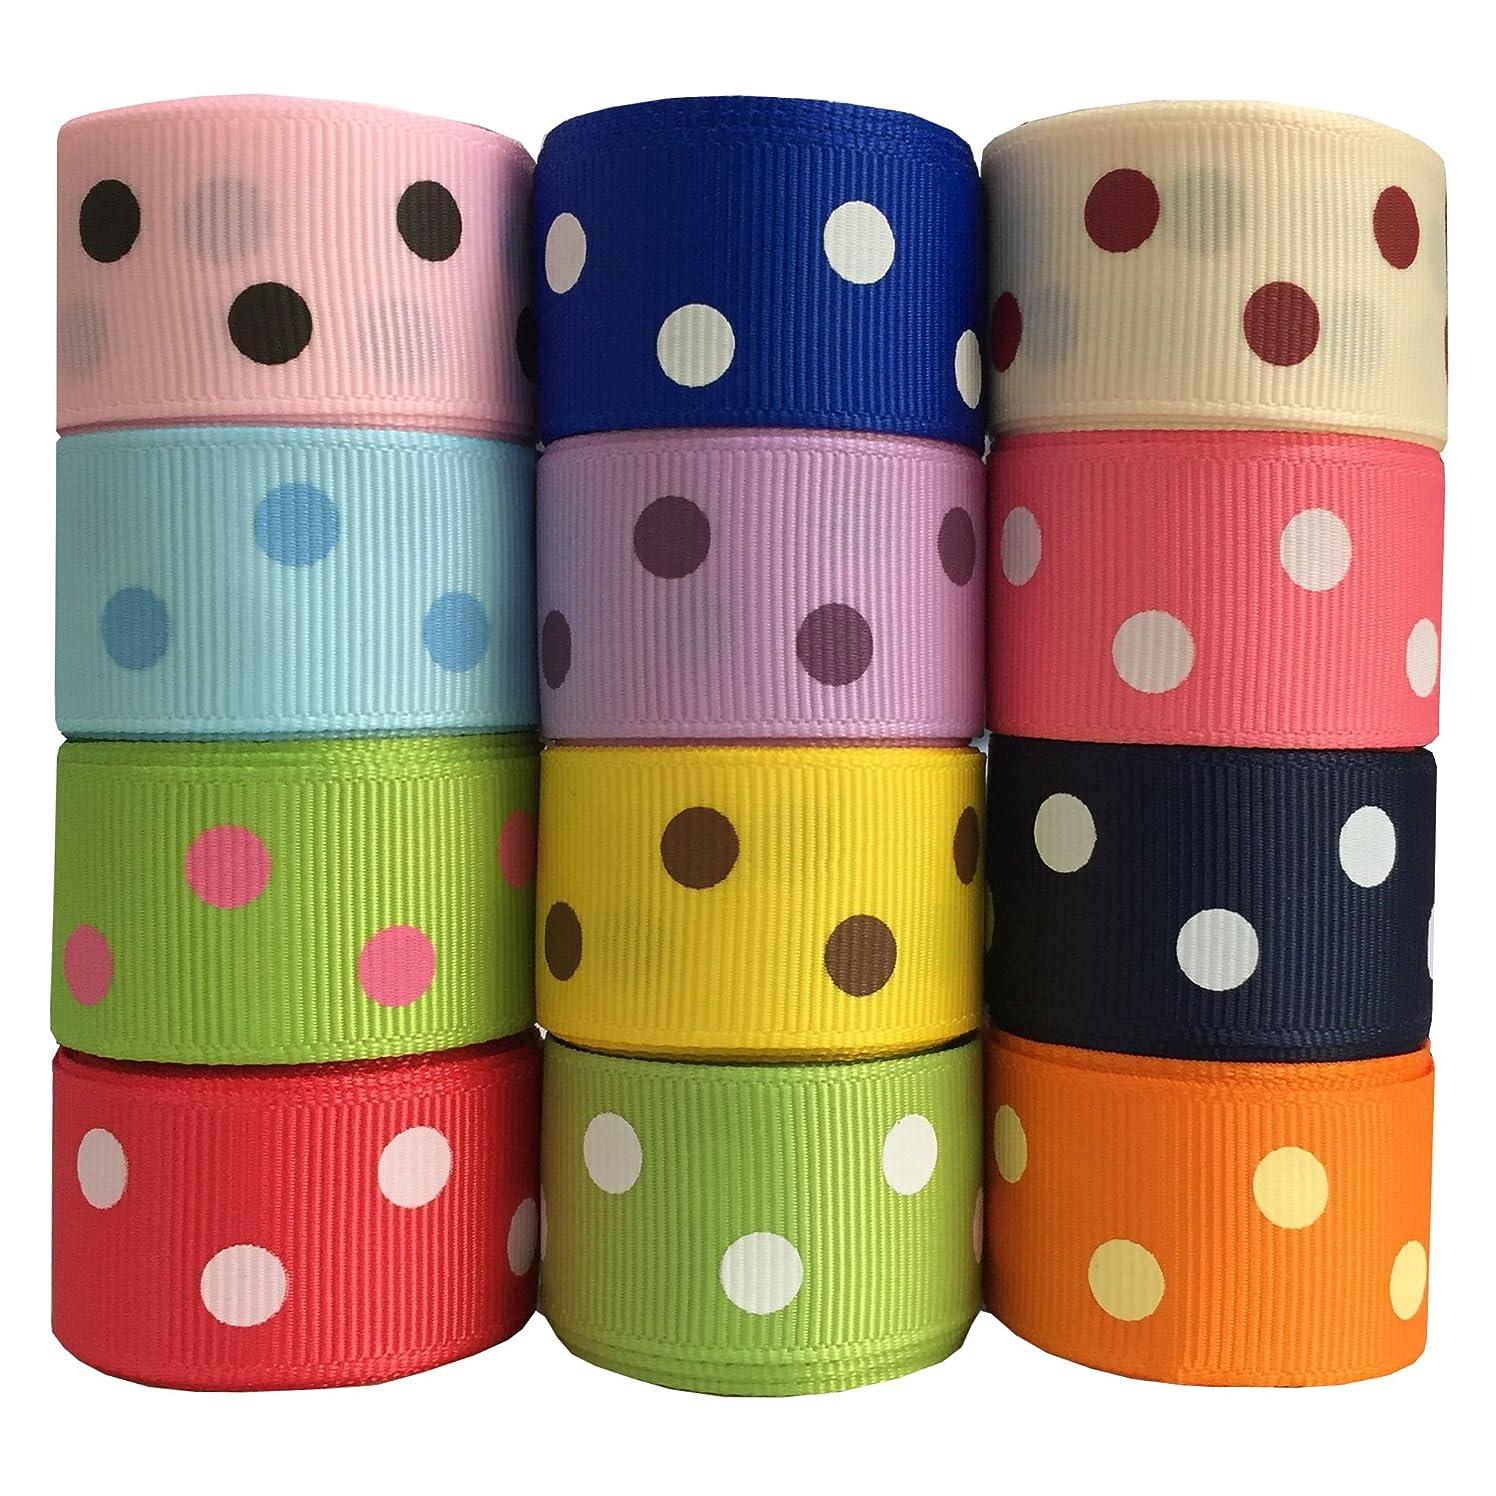 DUOQU 24 Yards 7/8 Inch Polka Dots Printed Grosgrain Ribbon (12 Colors, 2 Yard Each)